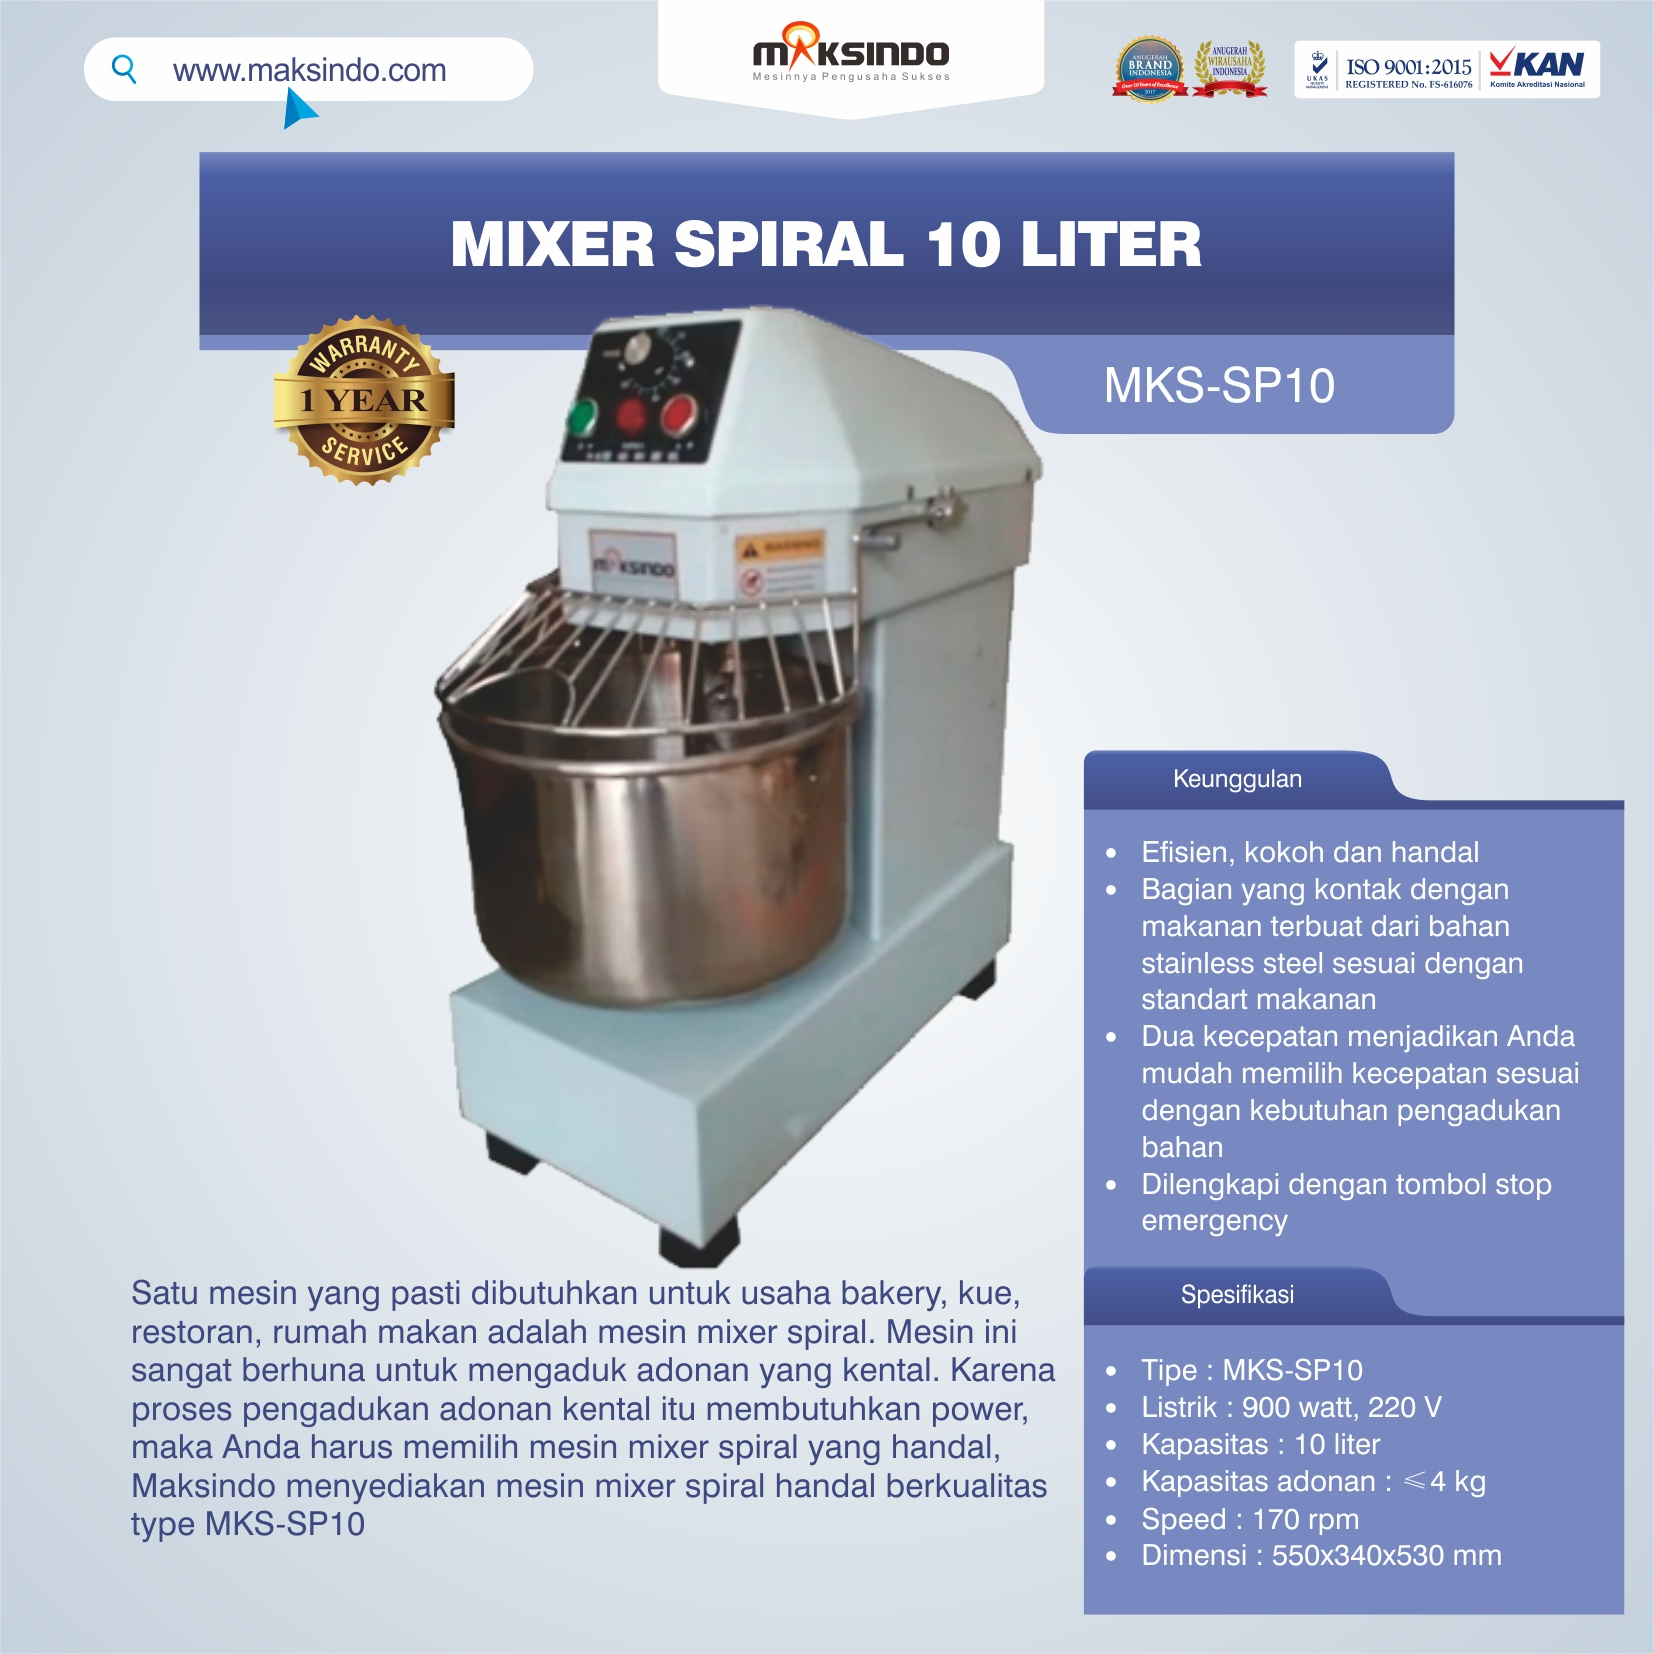 Jual Mixer Spiral 10 Liter (MKS-SP10) di Malang